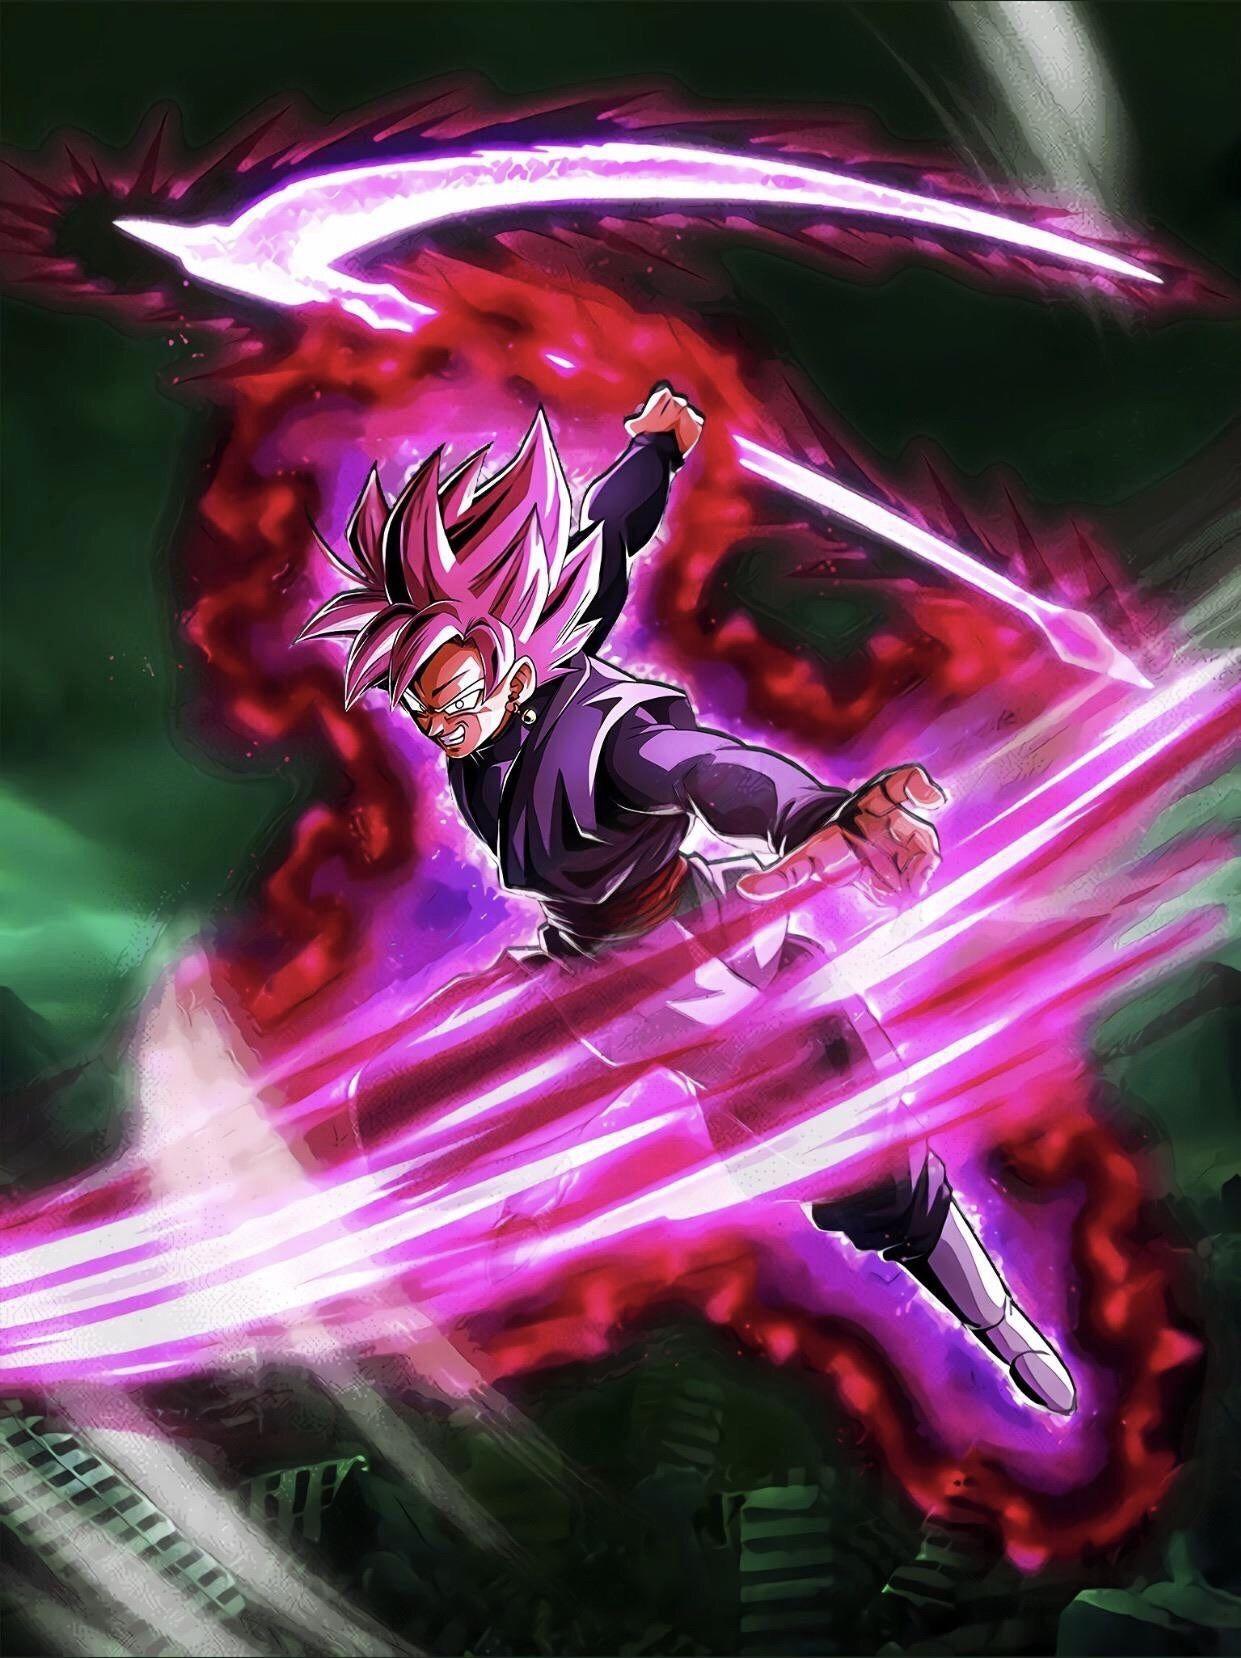 Super Saiyan Rose Goku Black Dokkan Battle Wallpaper Super Saiyan Rose Dragon Ball Super Goku Dragon Ball Super Manga